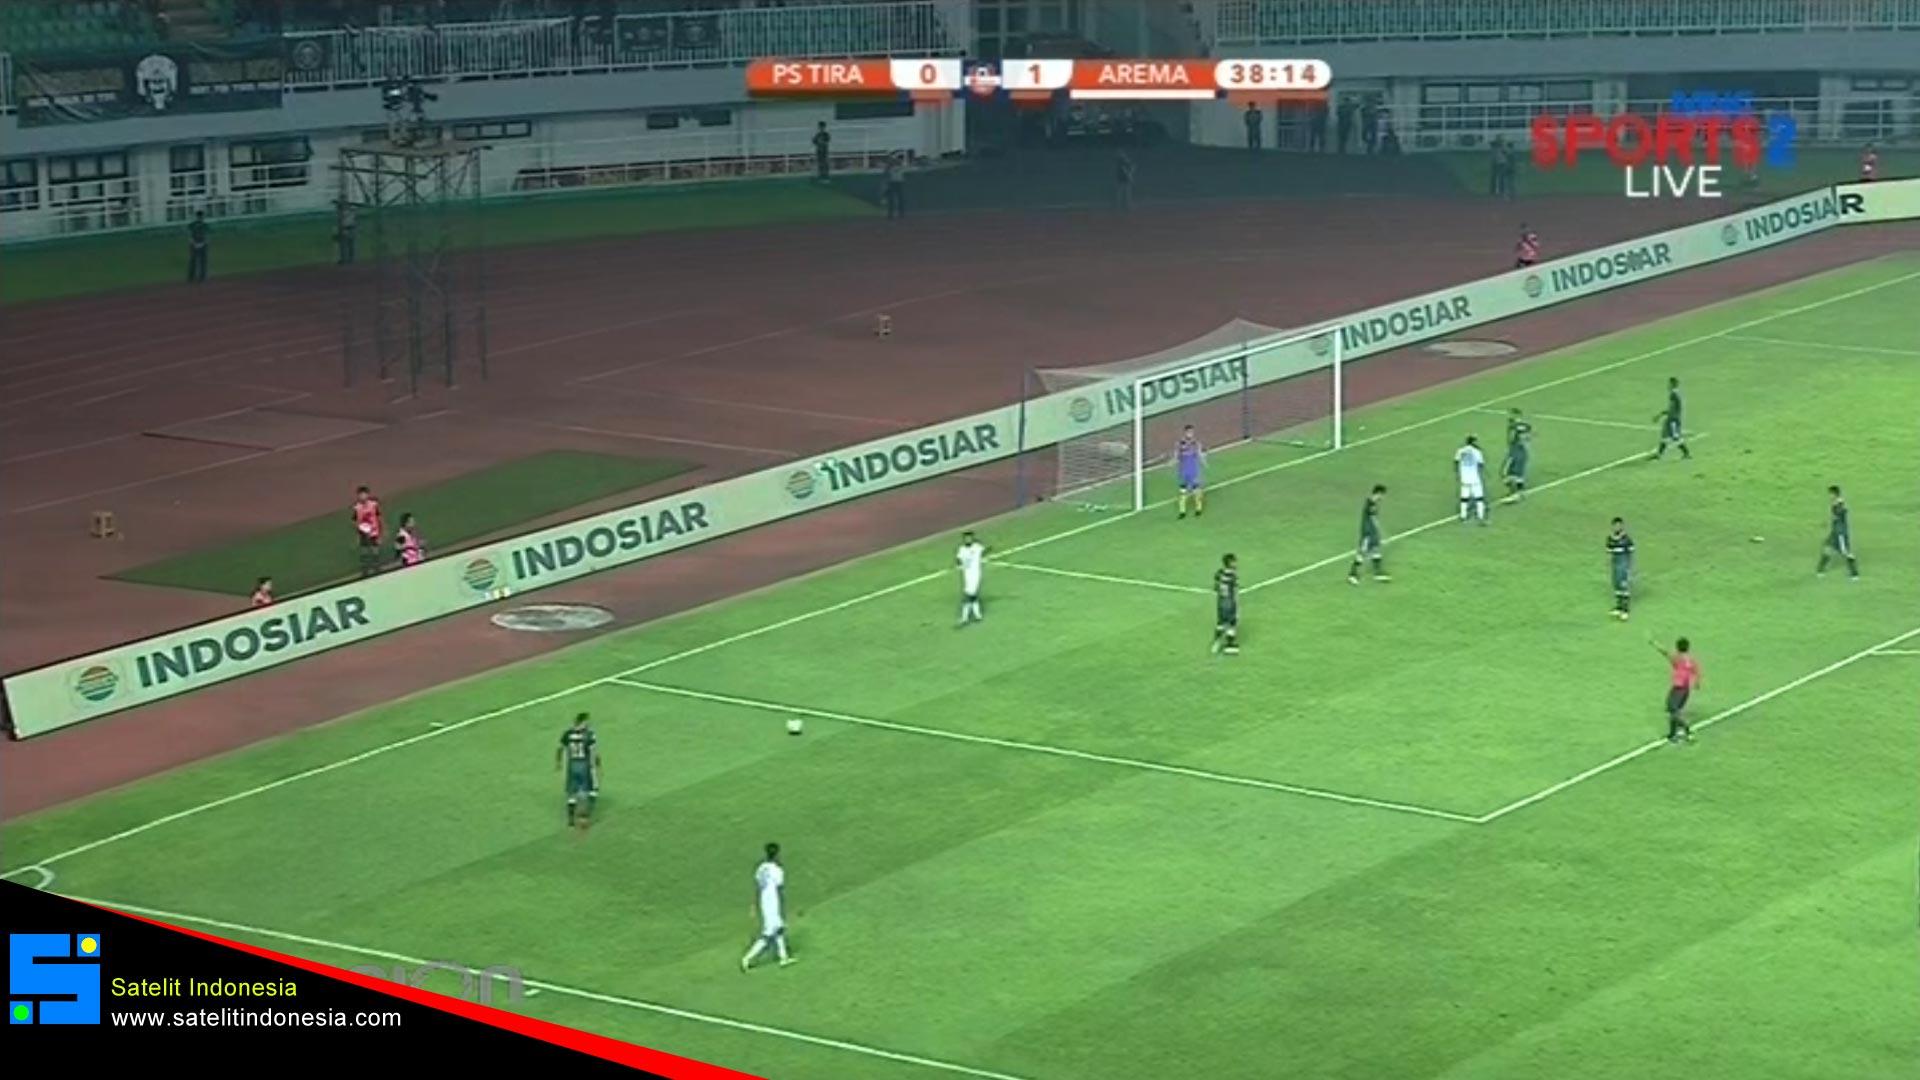 Channel TV Yang Menyiarkan Liga 1 Indonesia 2020 Shopee